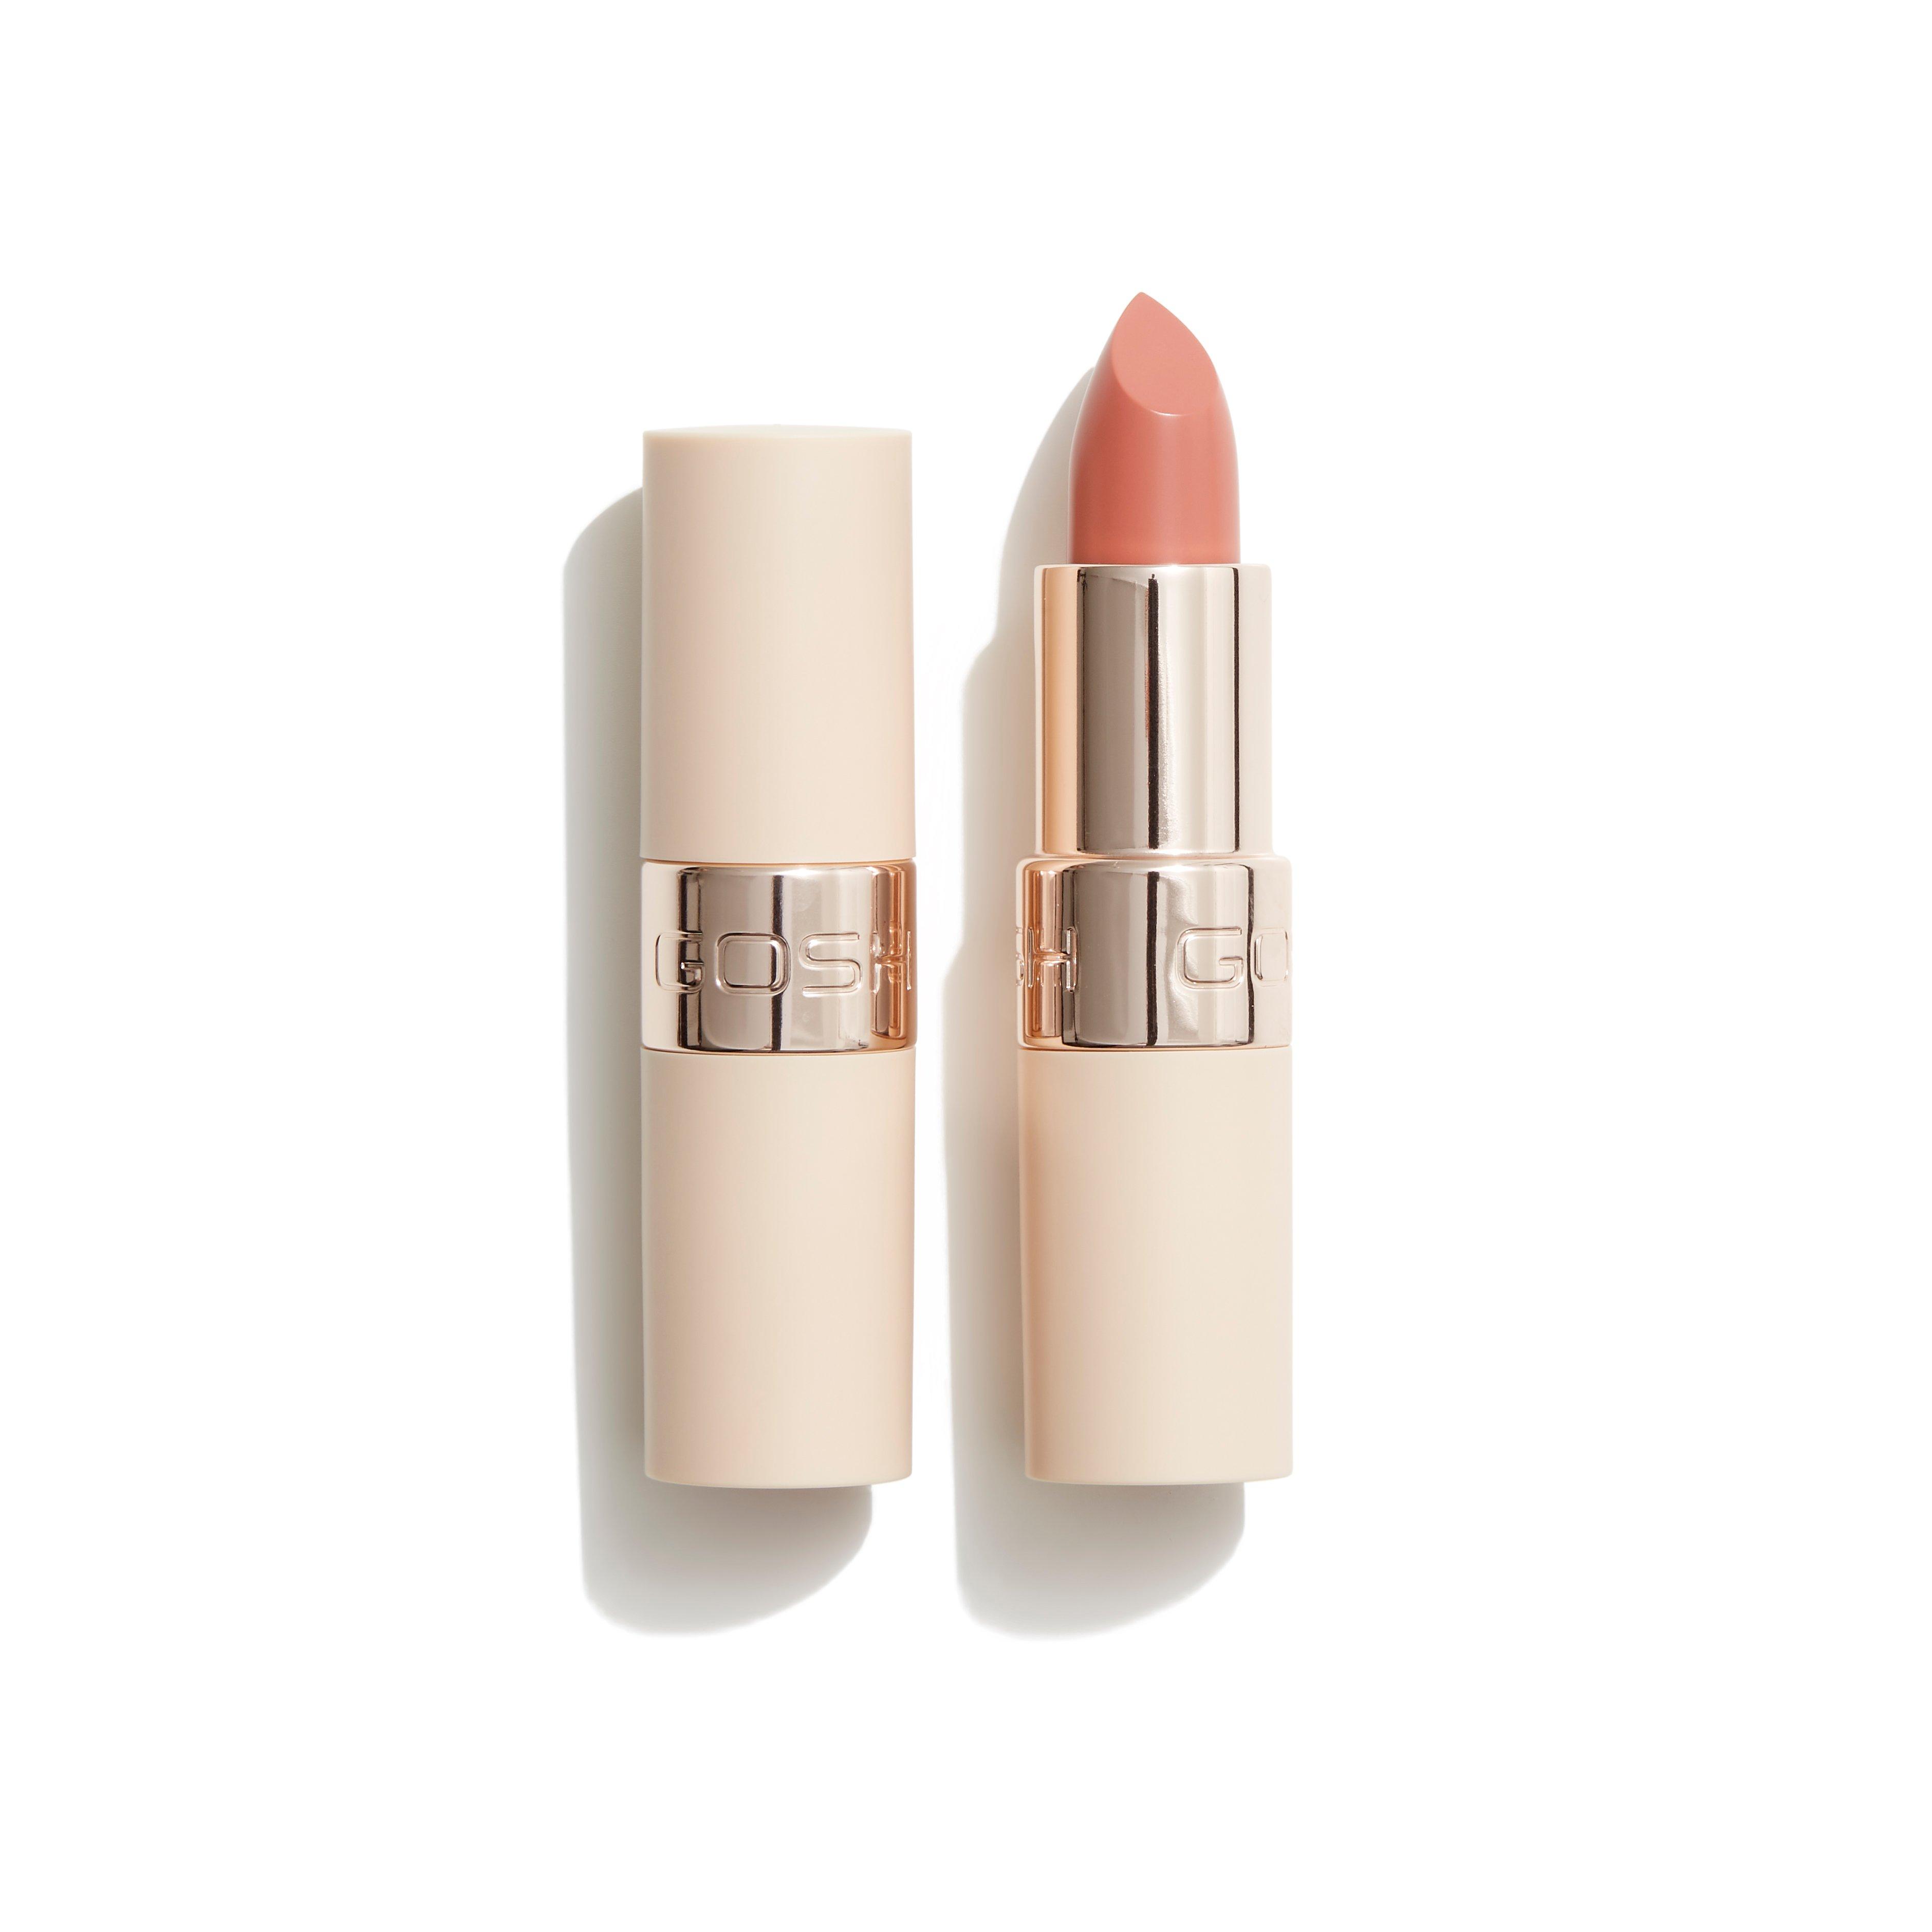 GOSH Copenhagen - Luxury Nude Lips - 001 Nudity